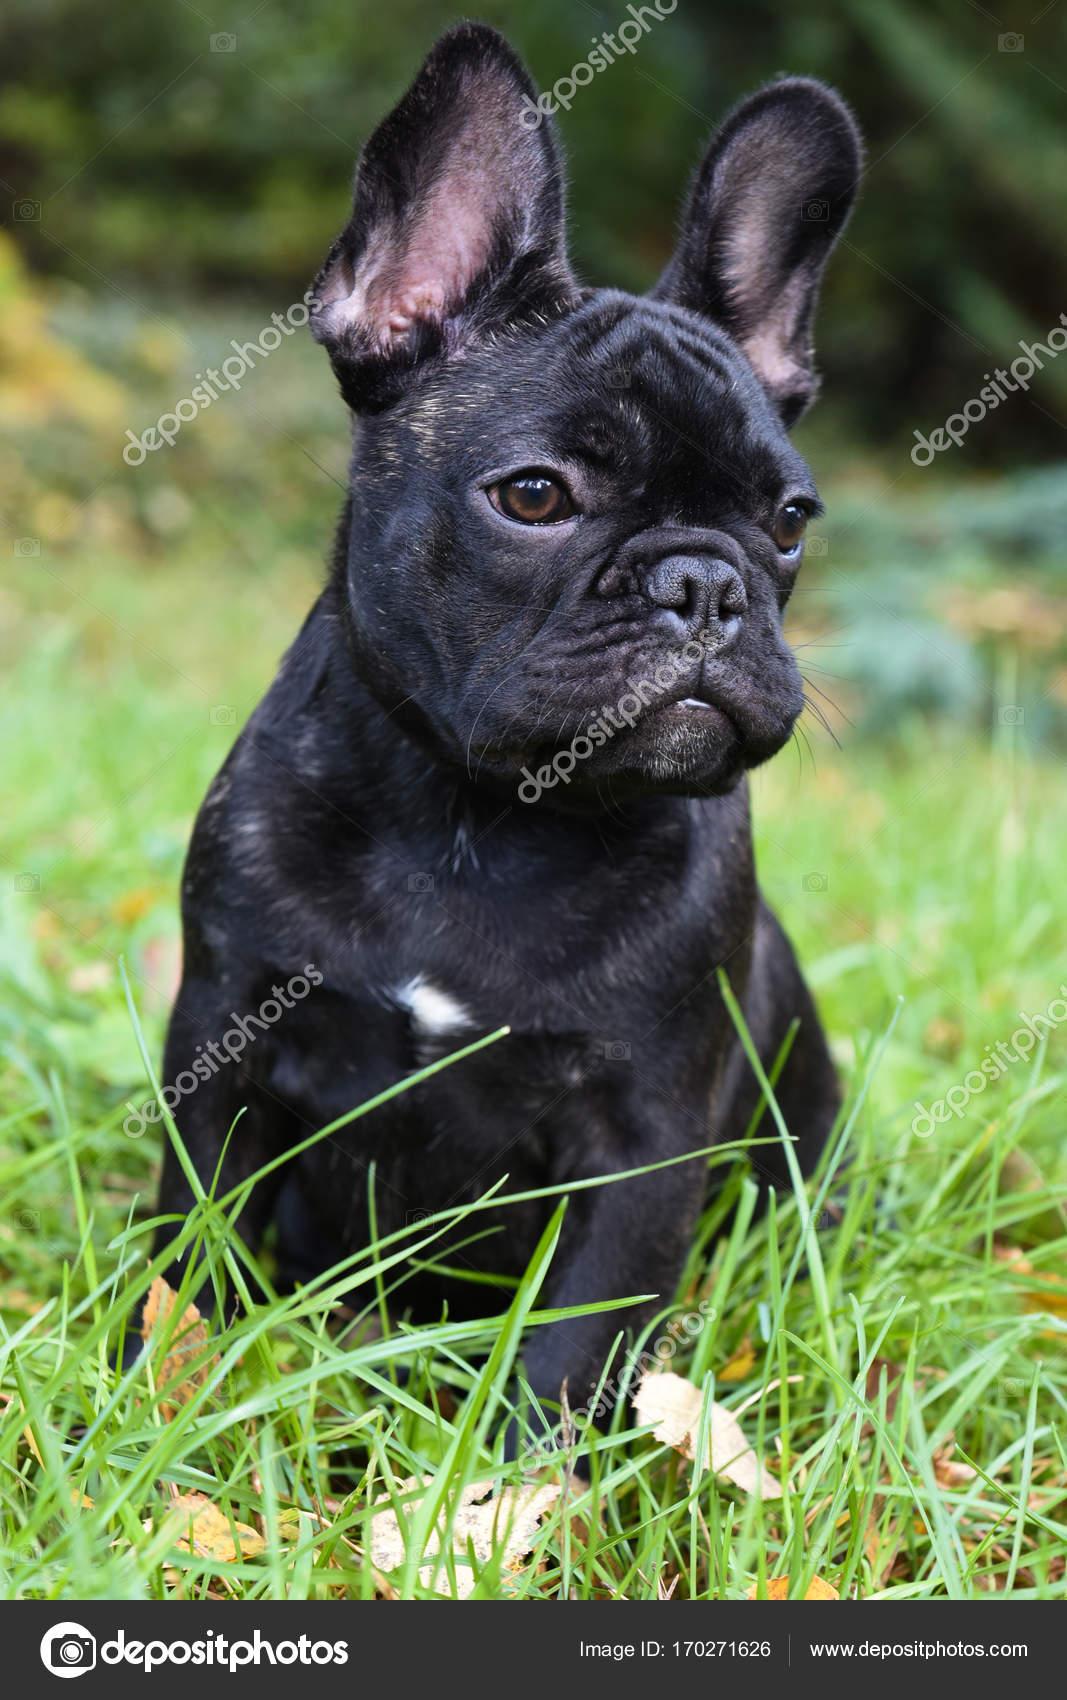 Pictures Black French Bulldog Puppy Black French Bulldog Puppy Stock Photo C Zannaholstova 170271626